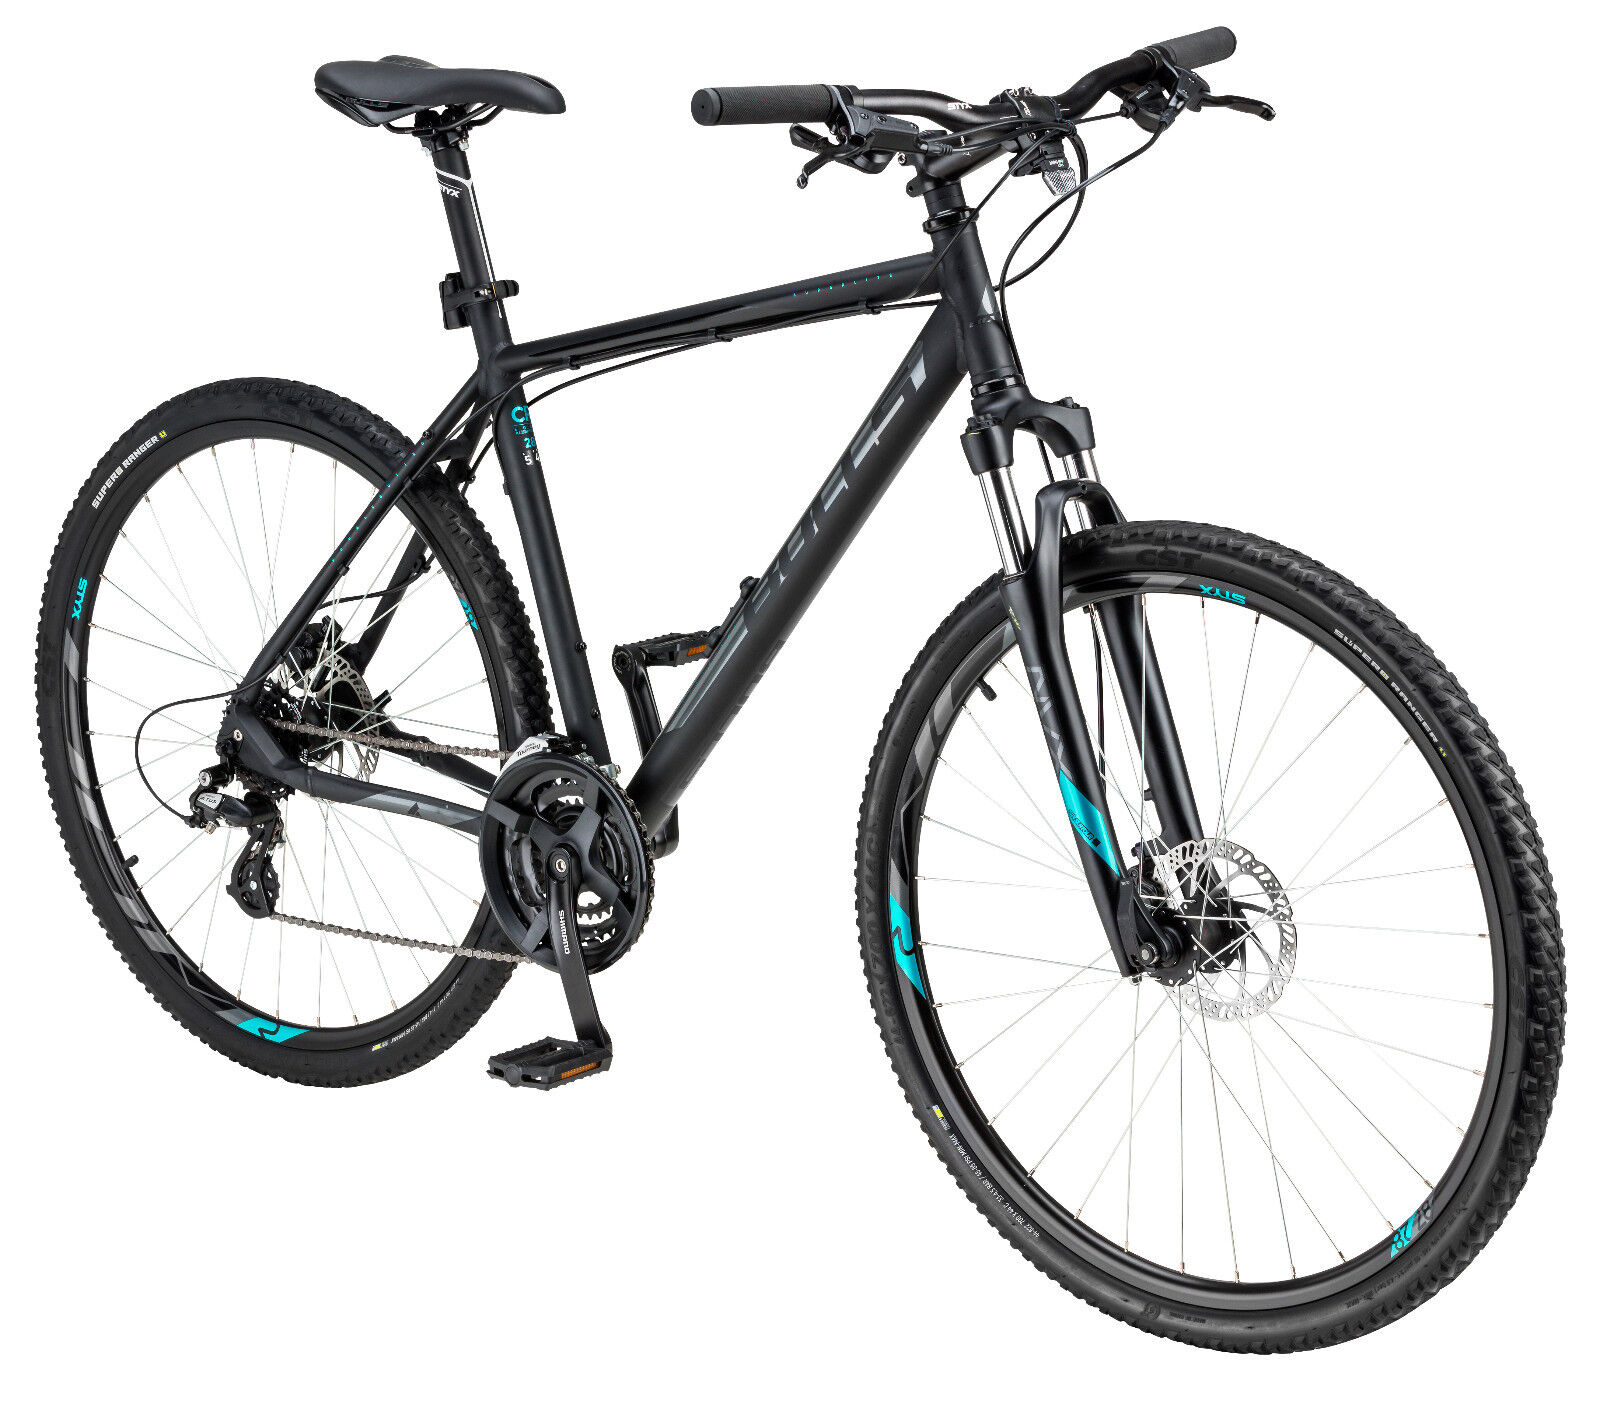 BULLS CROSSBIKE DISC 28 Zoll Crossrad Trekking Shimano Fahrrad schwarz 58cm 2019